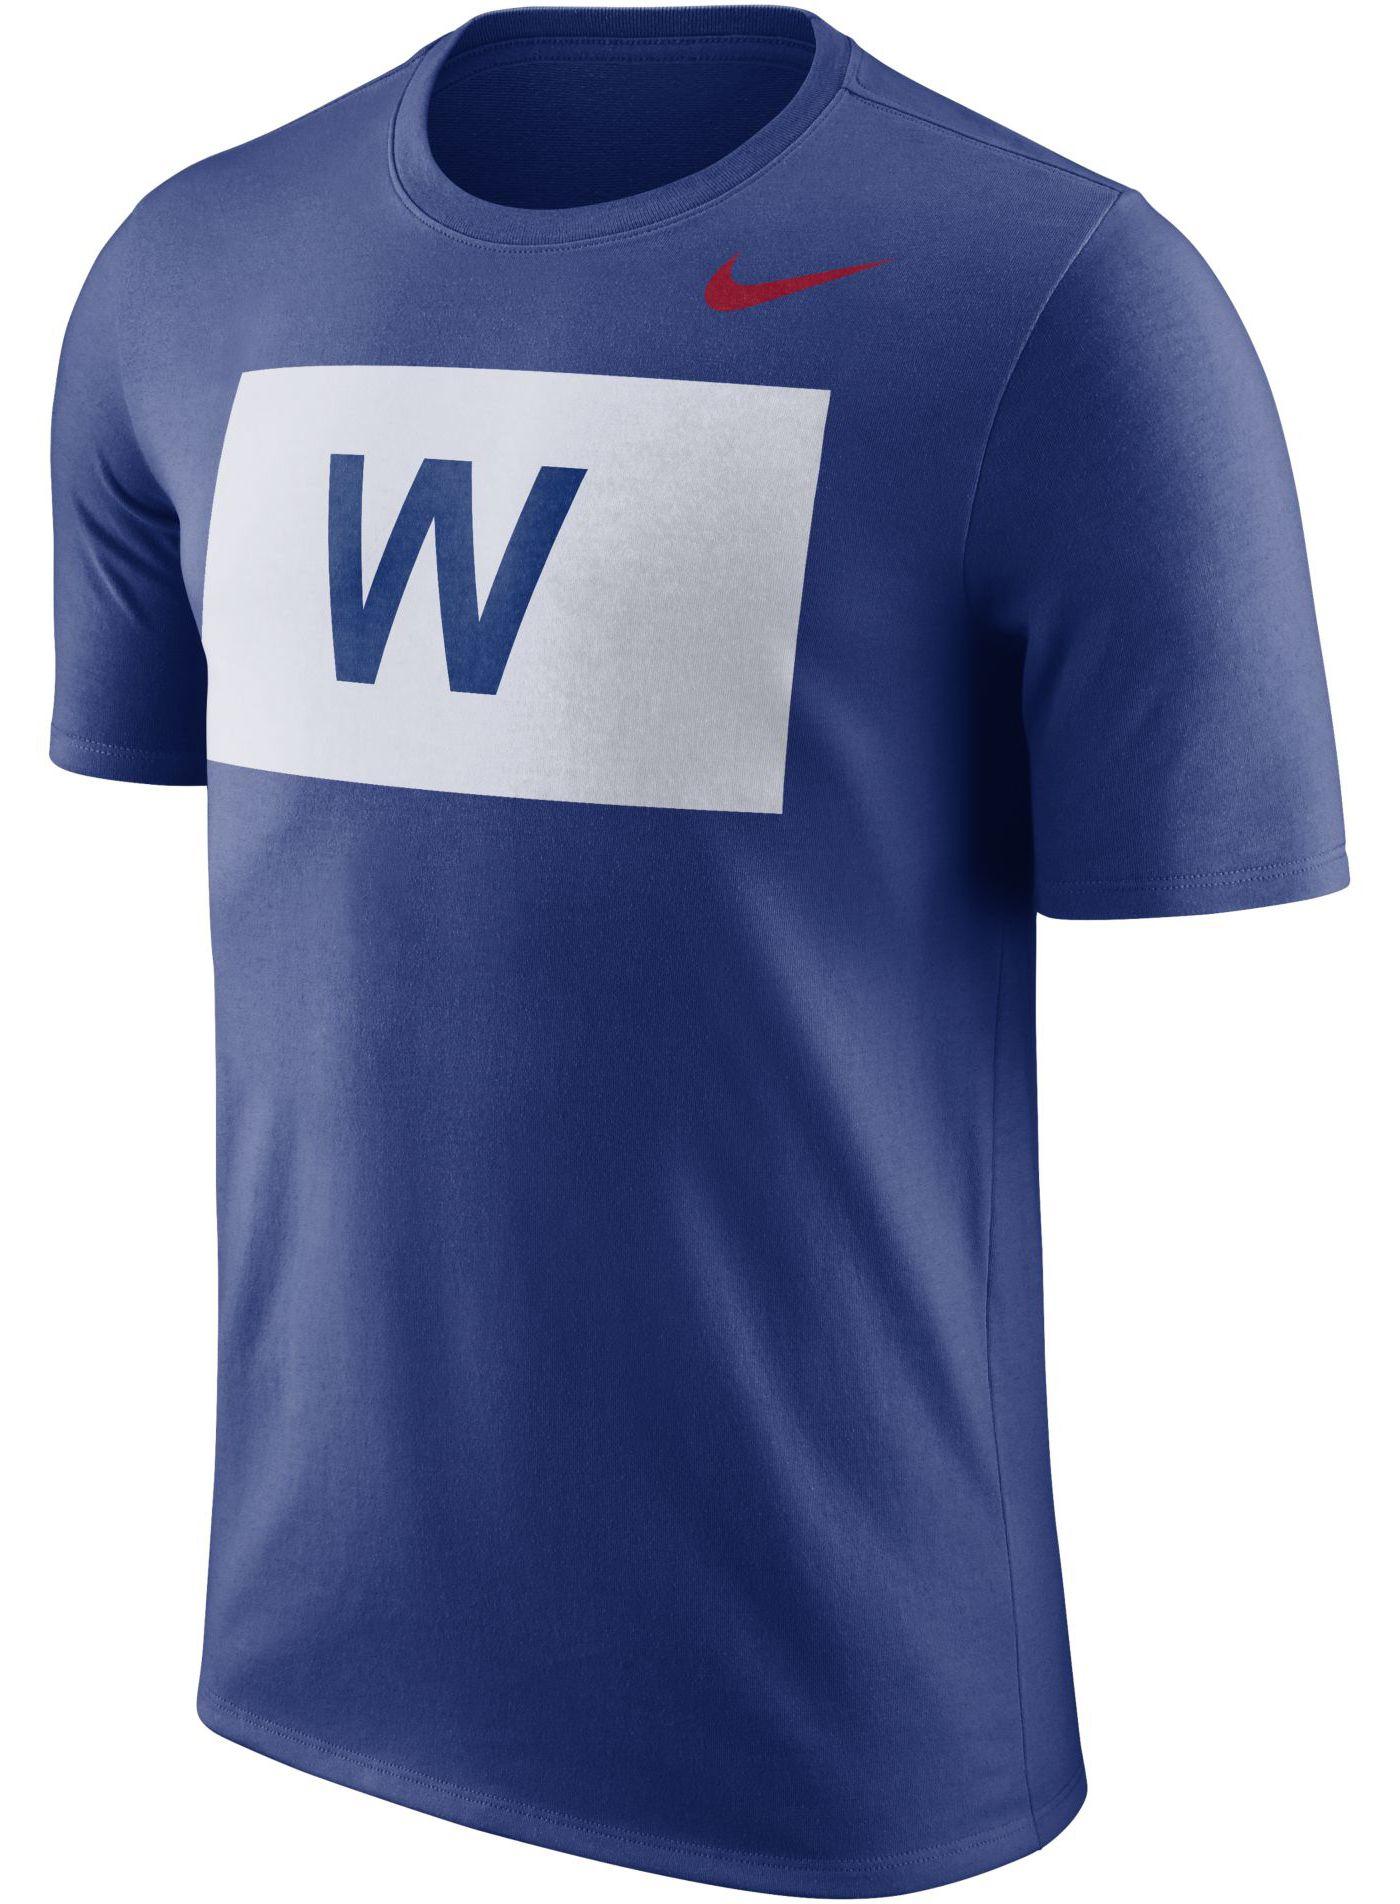 "Nike Men's Chicago Cubs Dri-FIT ""W Flag"" T-Shirt"